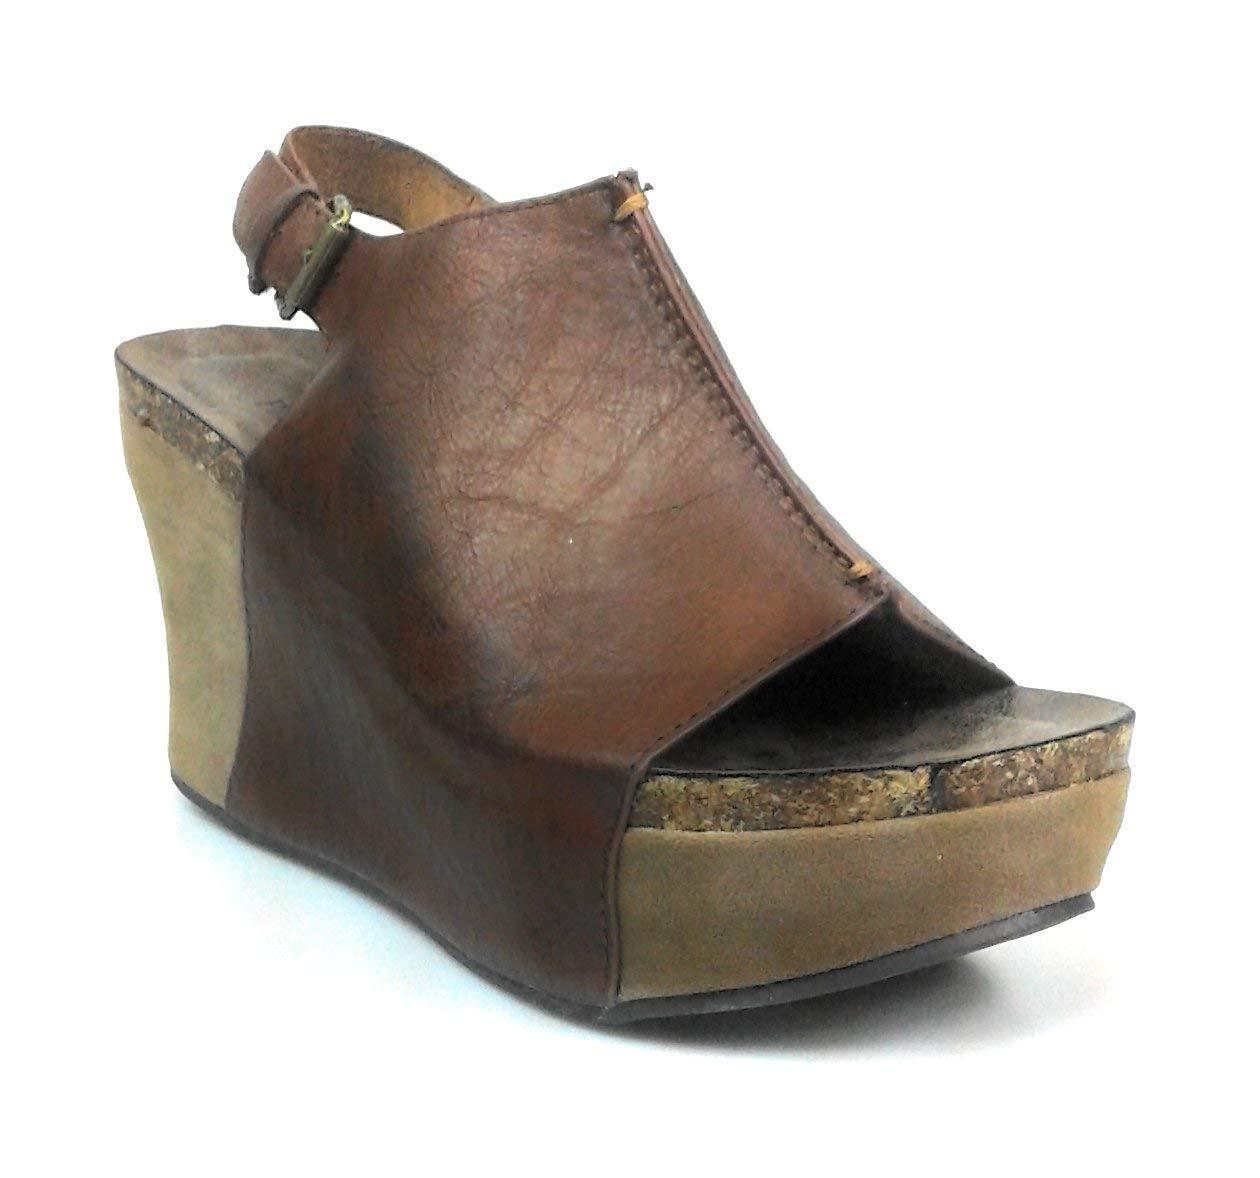 Pierre Dumas Hester-14 Women's Vegan Leather Peep-Toe Adjustable Ankle Strap Wedge Sandals (8 B(M) US, Whiskey)